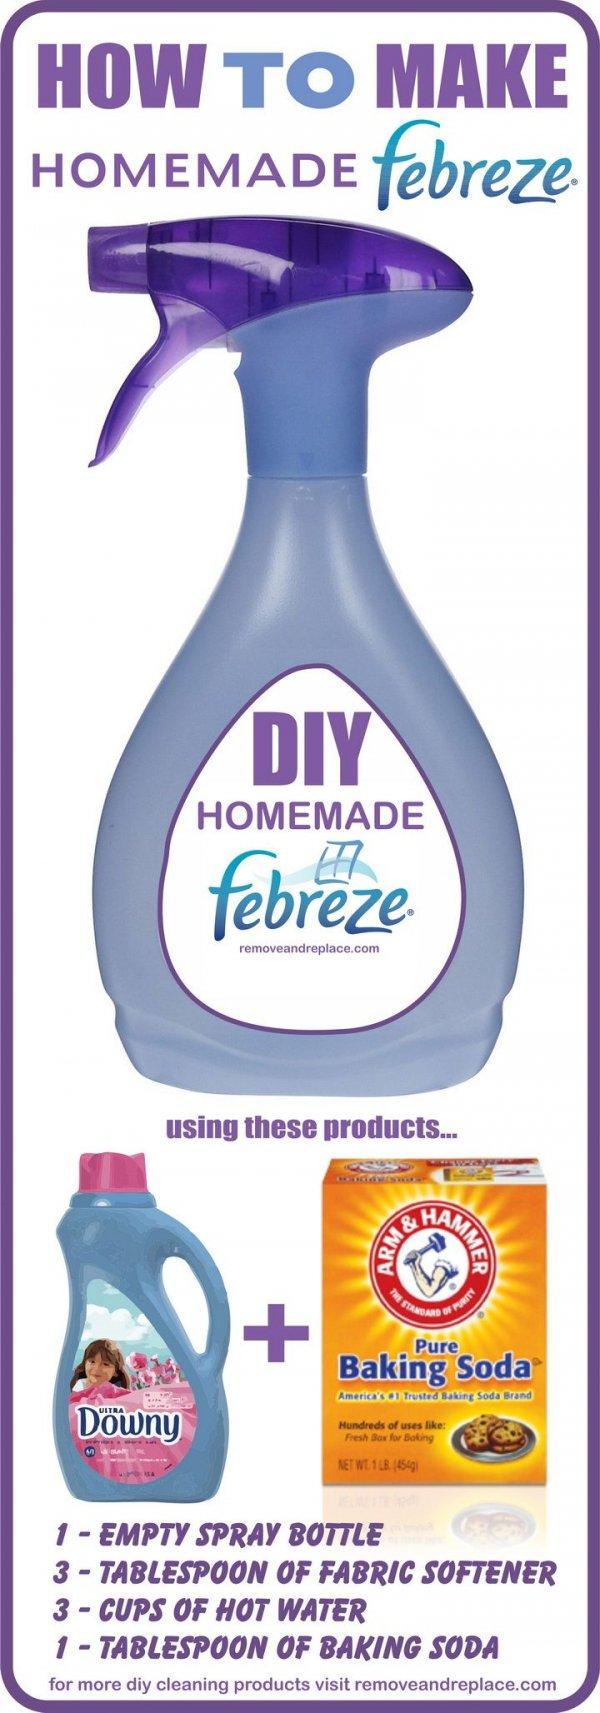 Febreze,Arm & Hammer,product,HOW,MAKE,